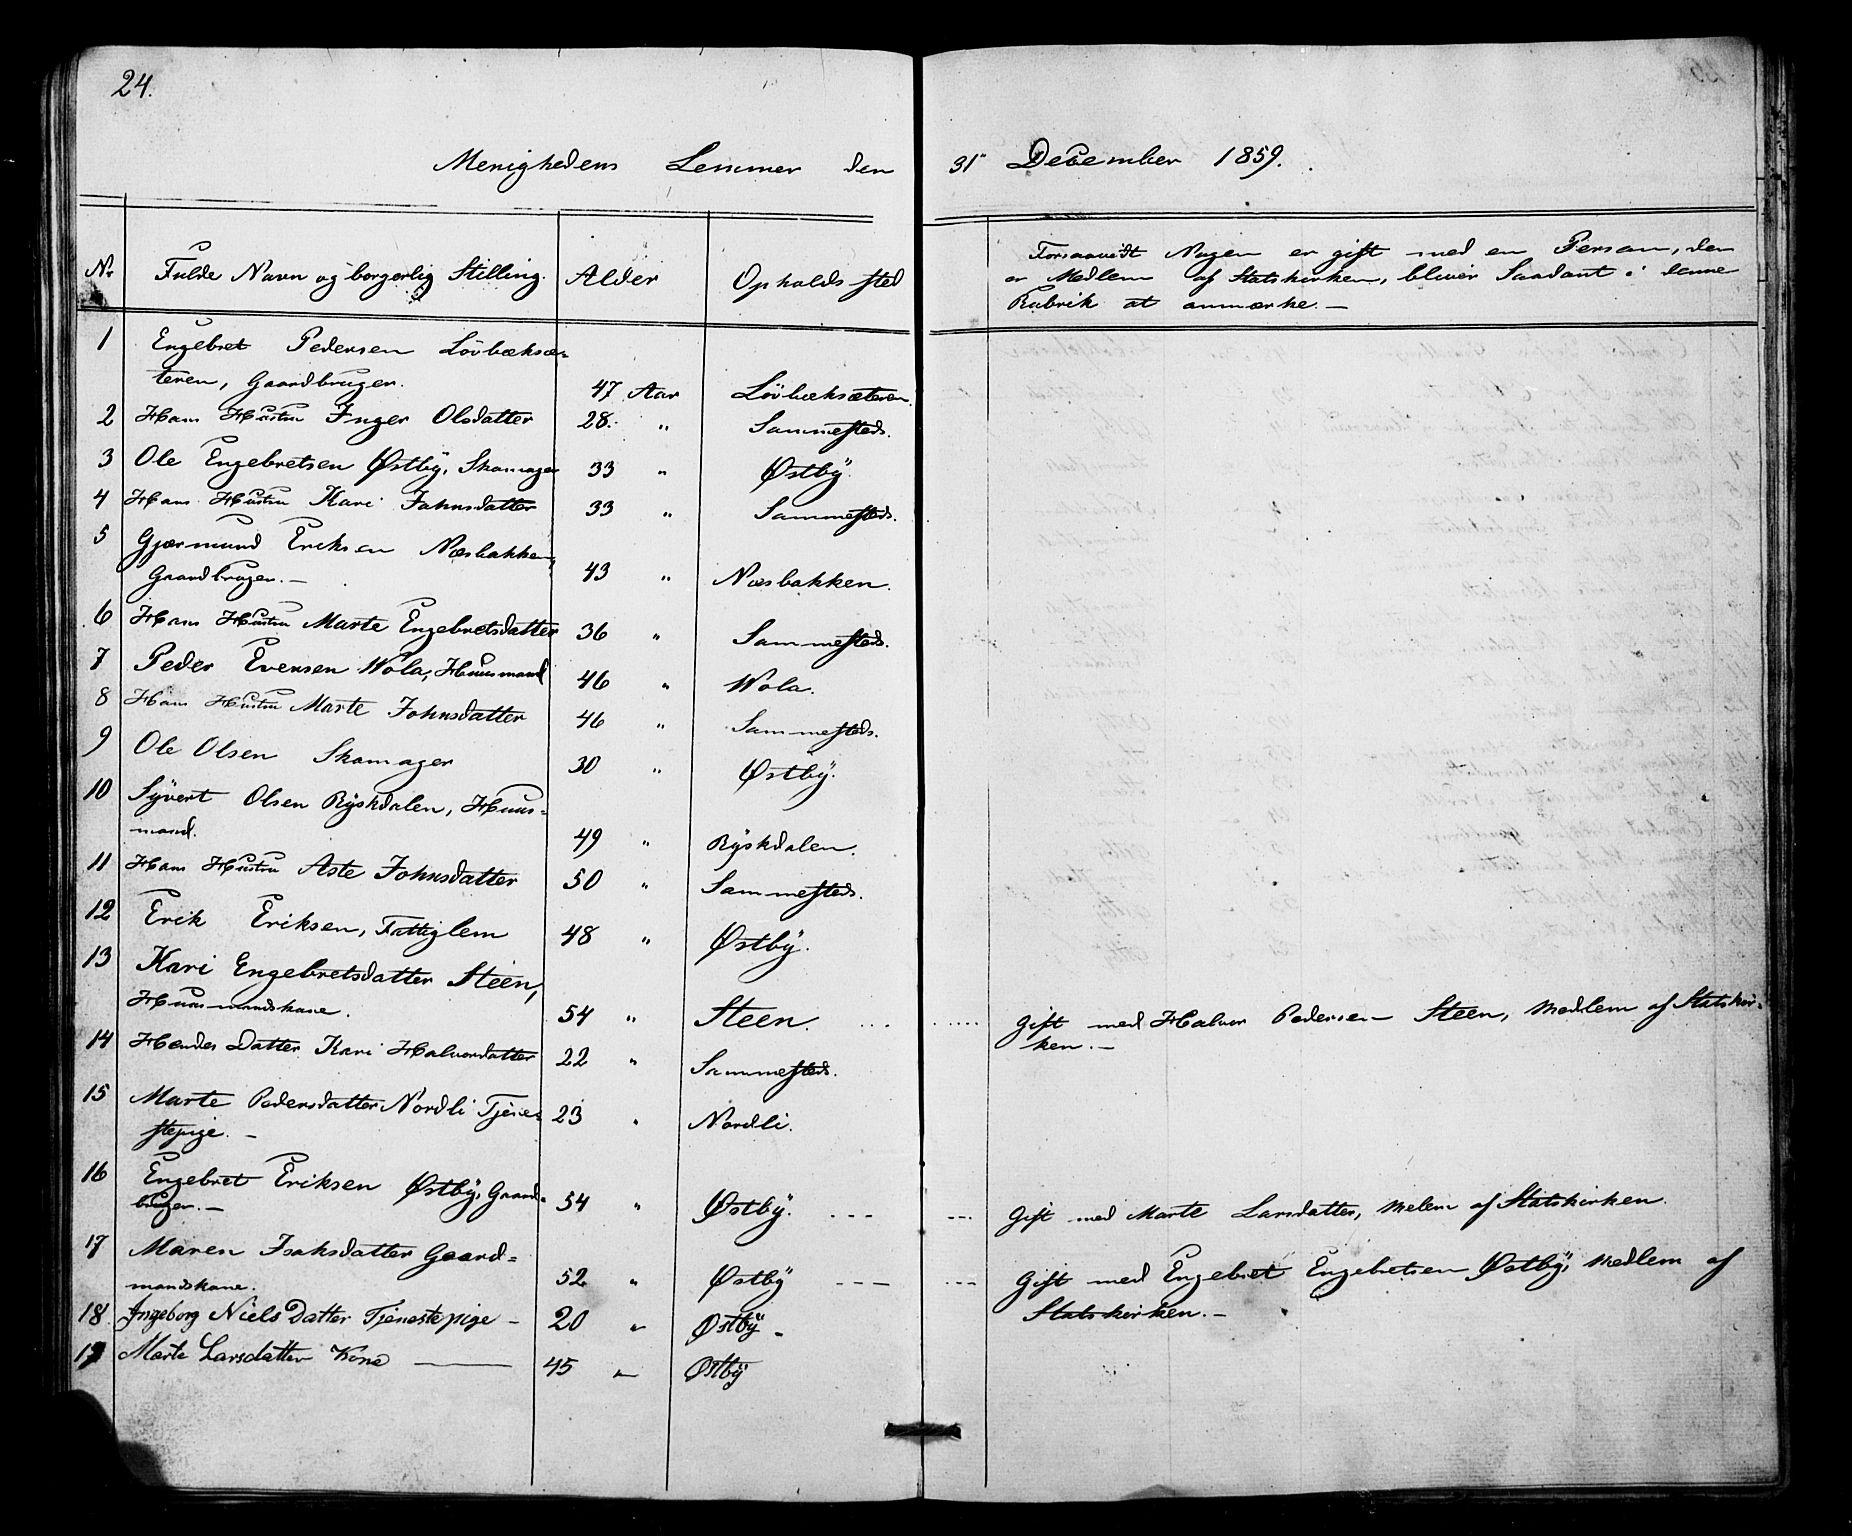 SAH, Misjonsforbundet, 01/L0001: Dissenterprotokoll nr. 1, 1858-1881, s. 24